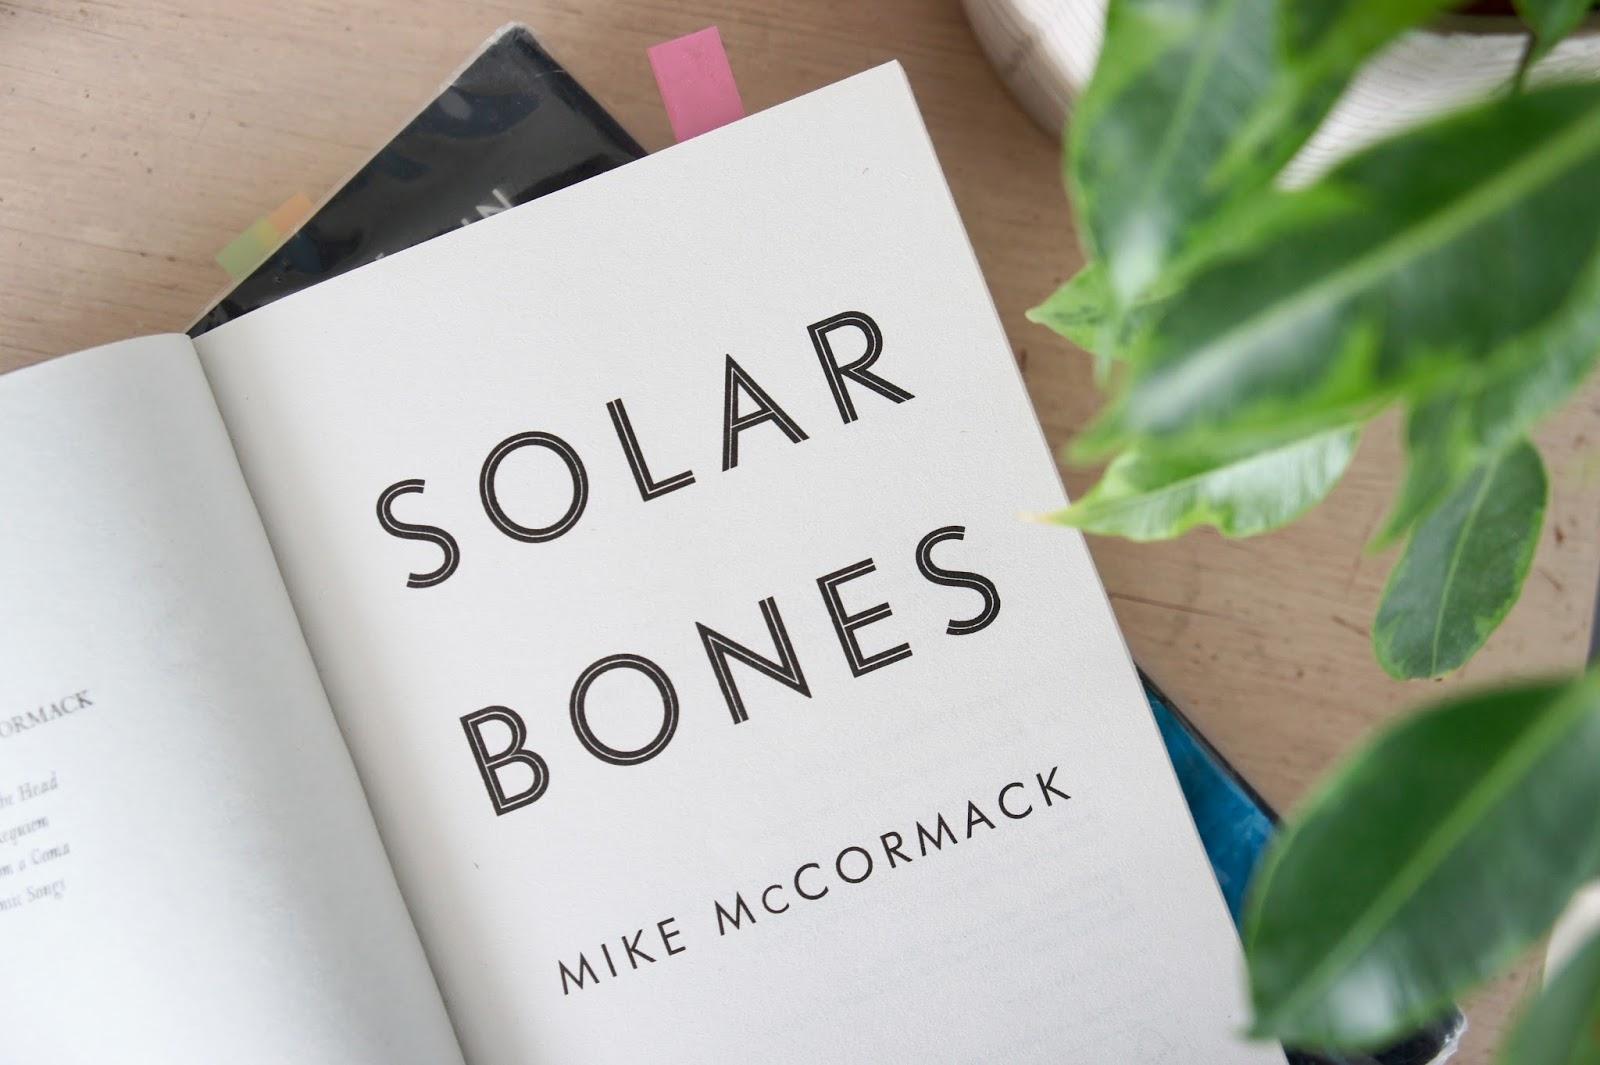 solar bones february tbr book blog